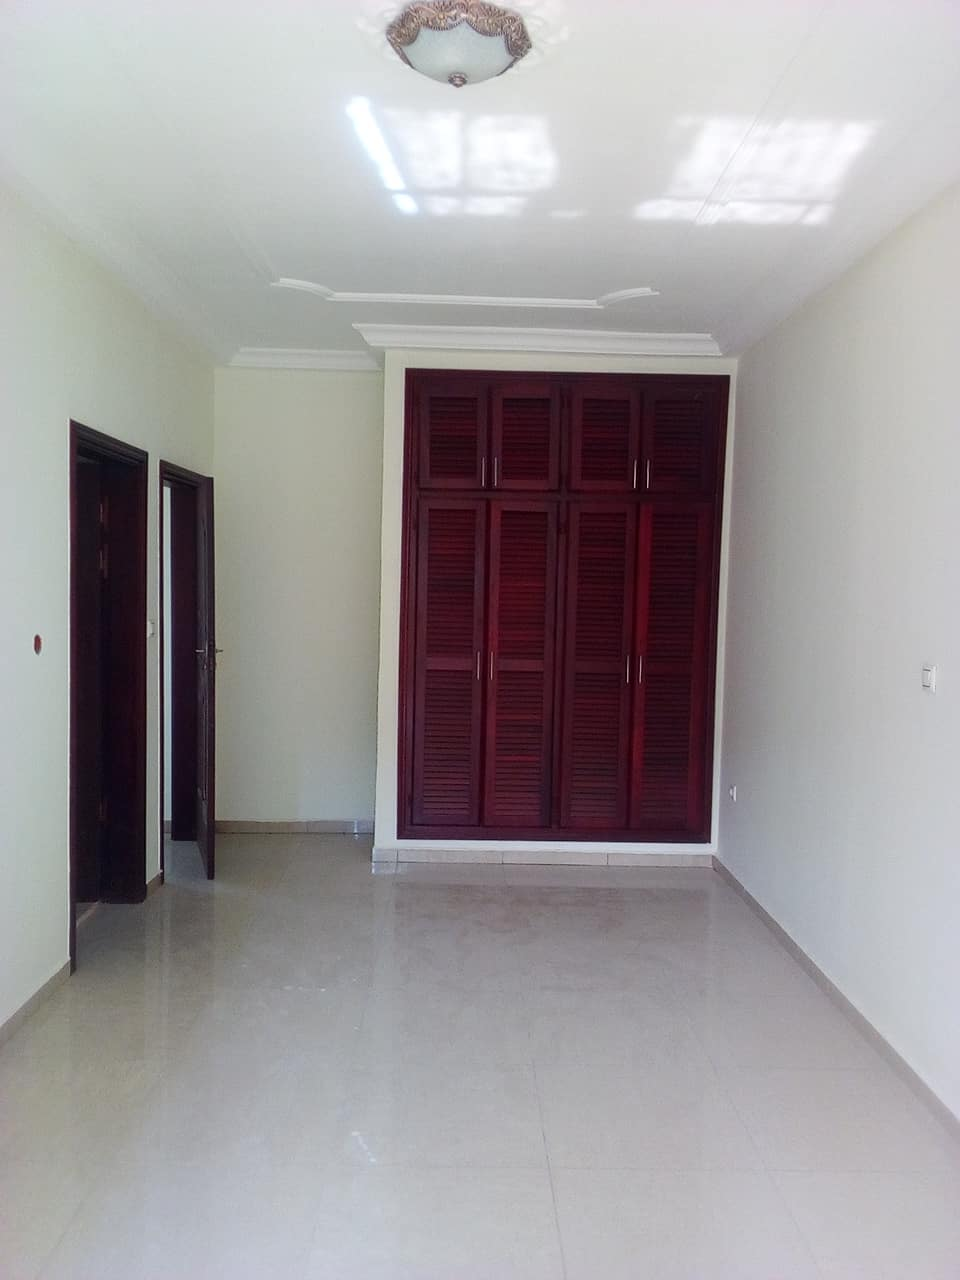 Apartment to rent - Yaoundé, Bastos, golf - 1 living room(s), 2 bedroom(s), 3 bathroom(s) - 700 000 FCFA / month